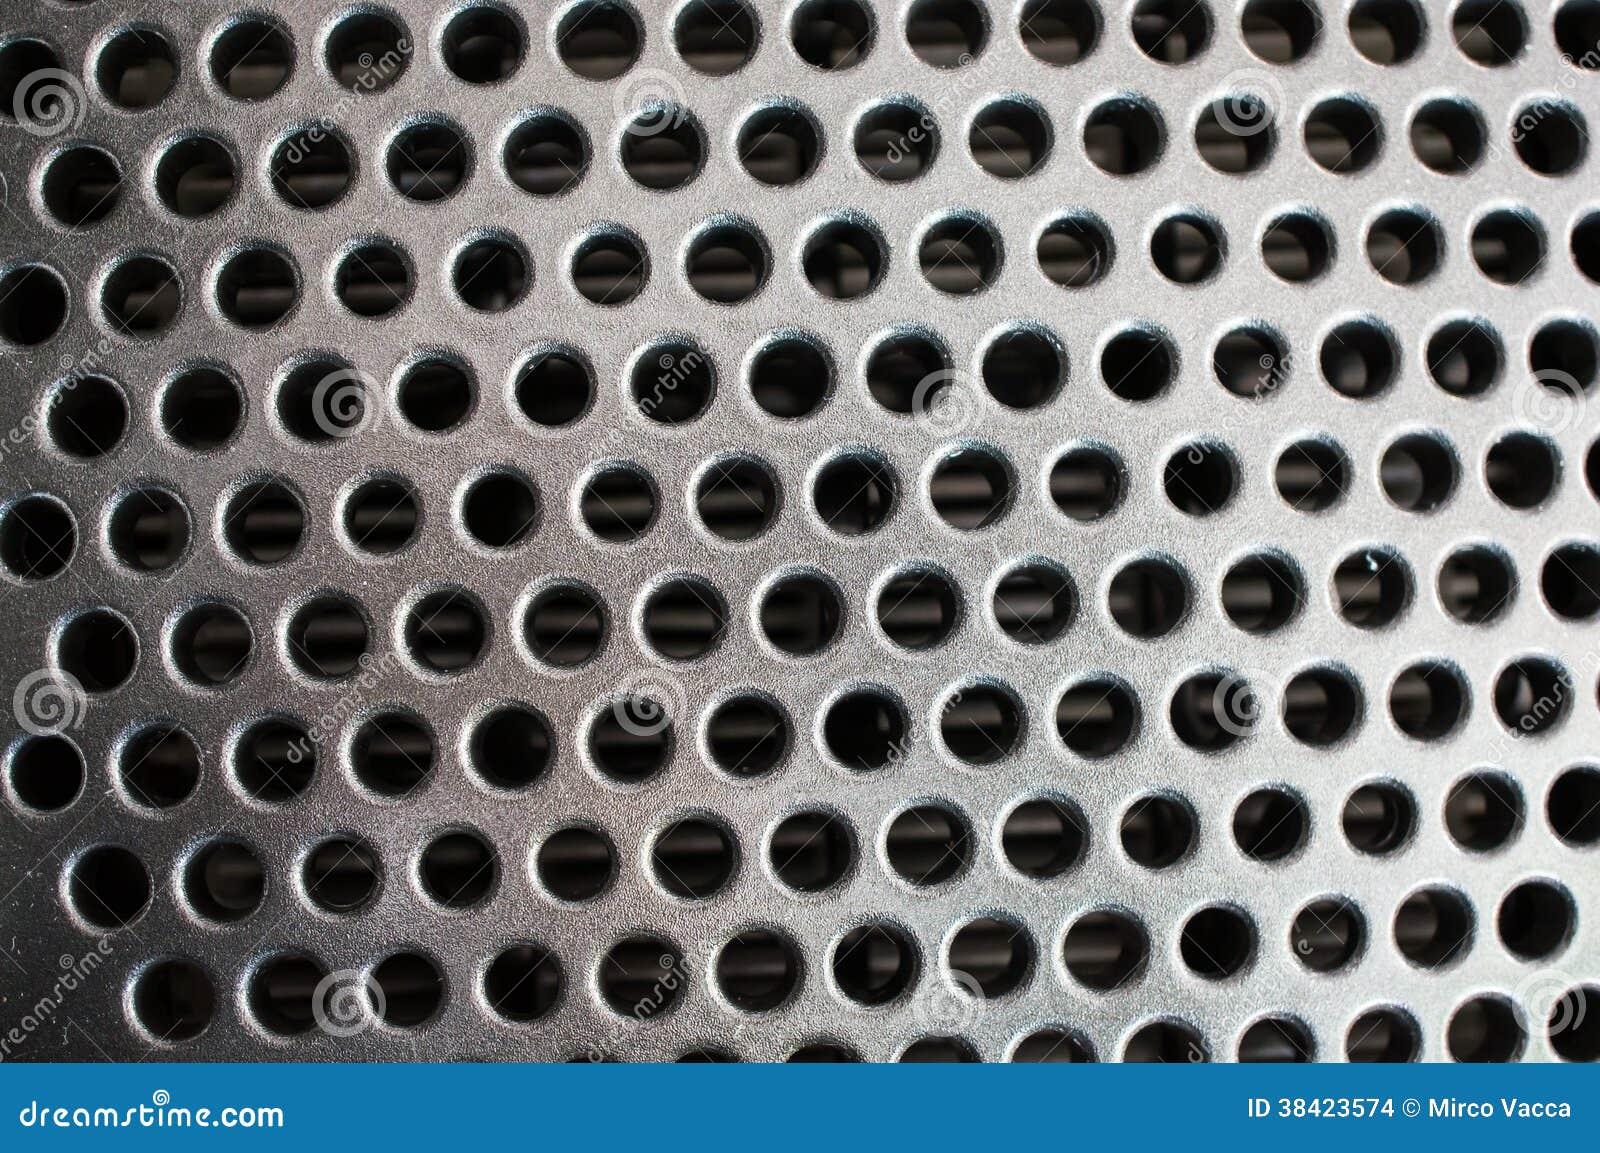 Ventilation Holes Stock Photo Image Of Metal Many